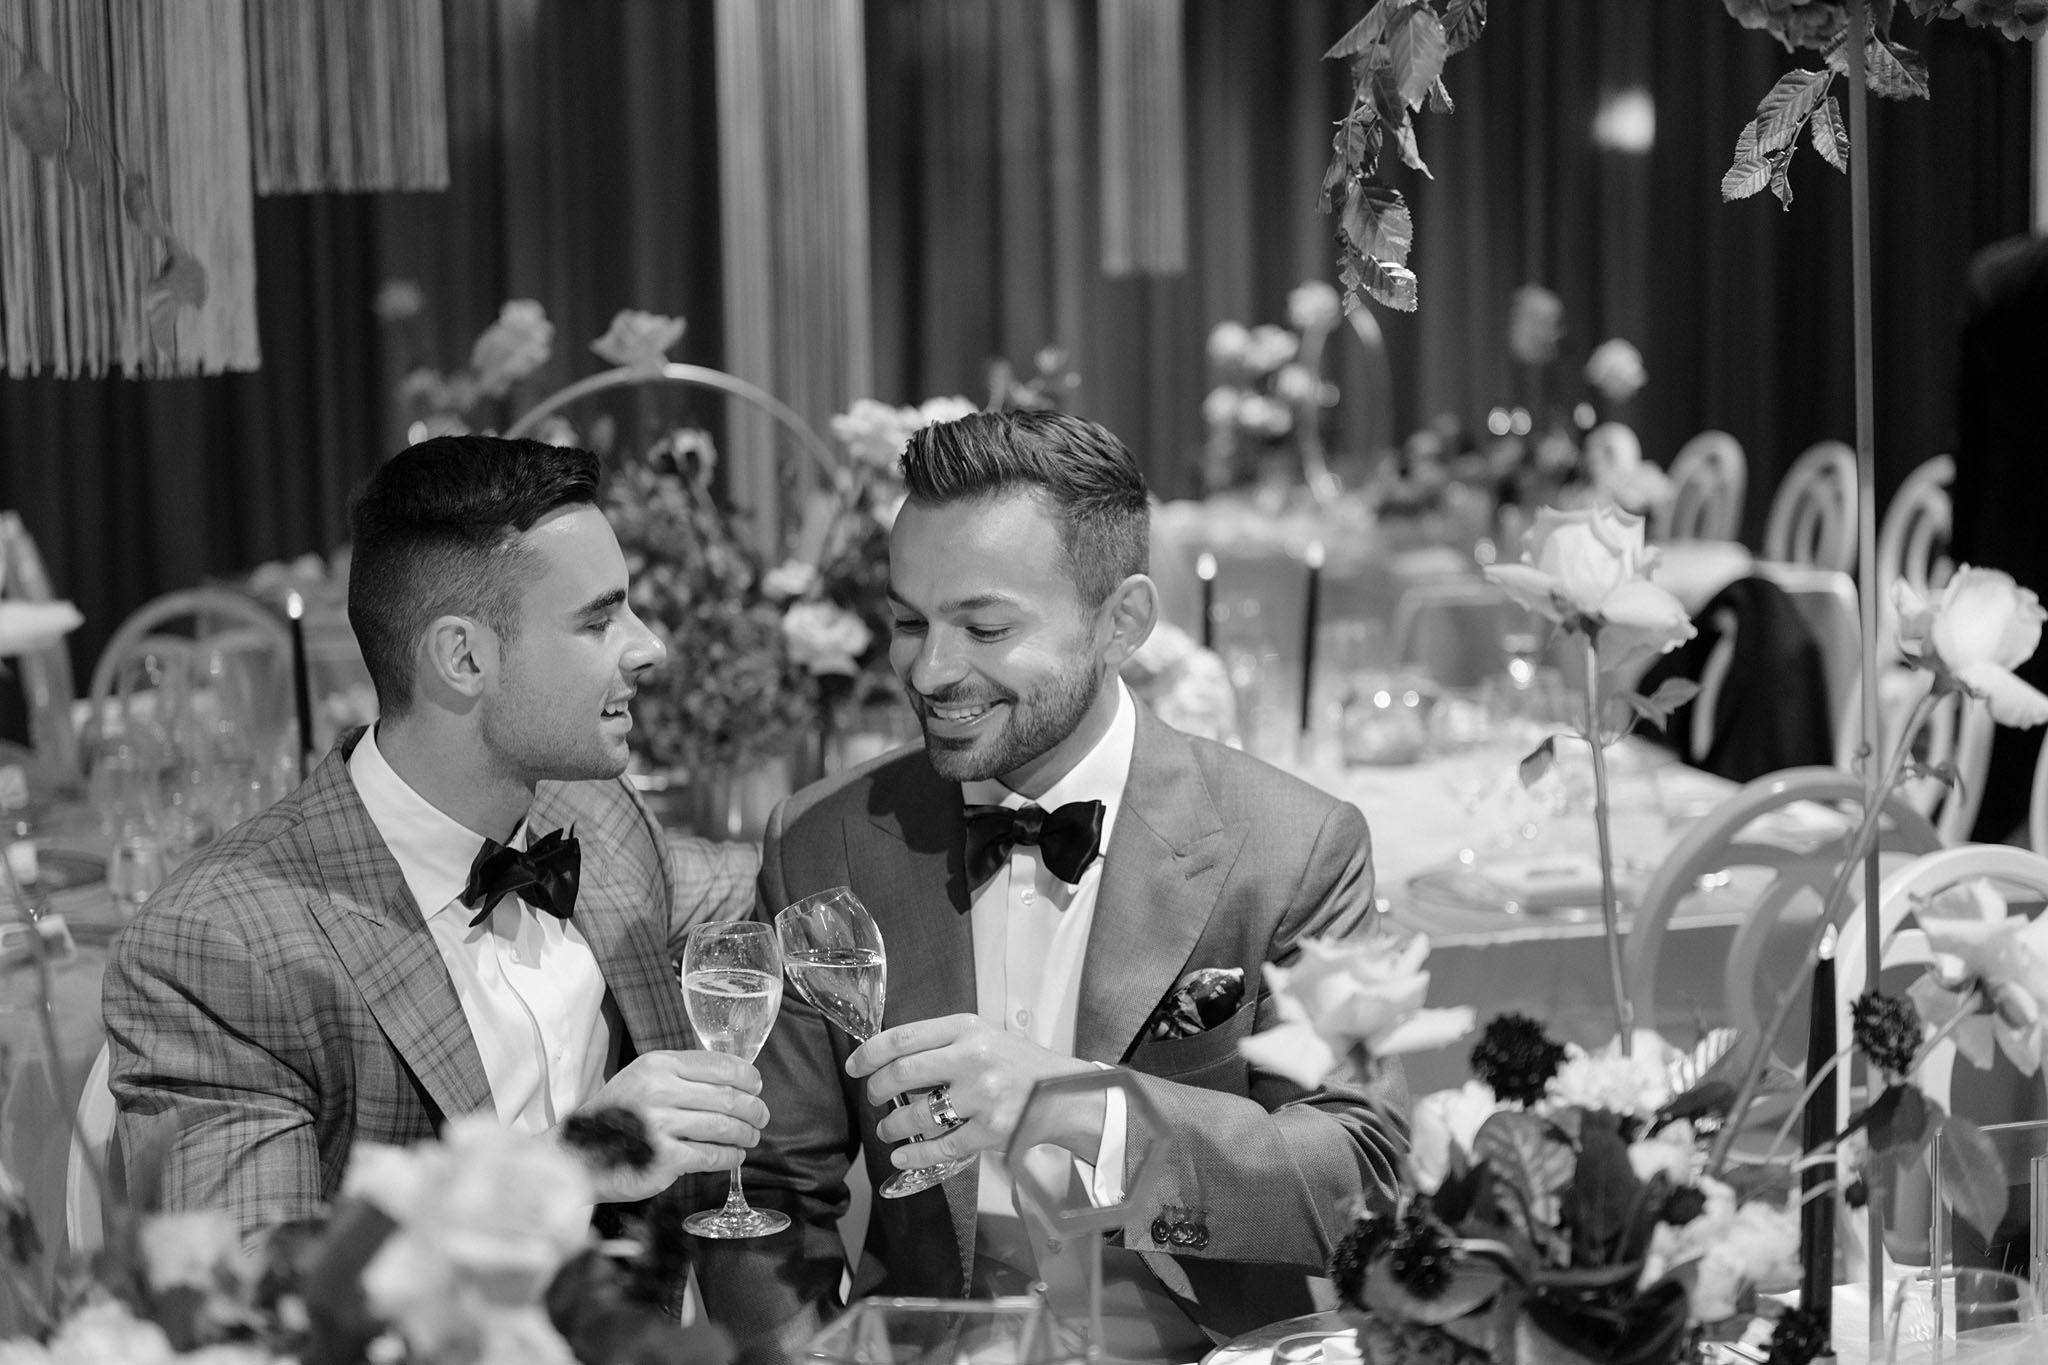 Taylor-Fielding-Matt-Joudo/Brisbane-Same-Sex-Wedding-Editorial